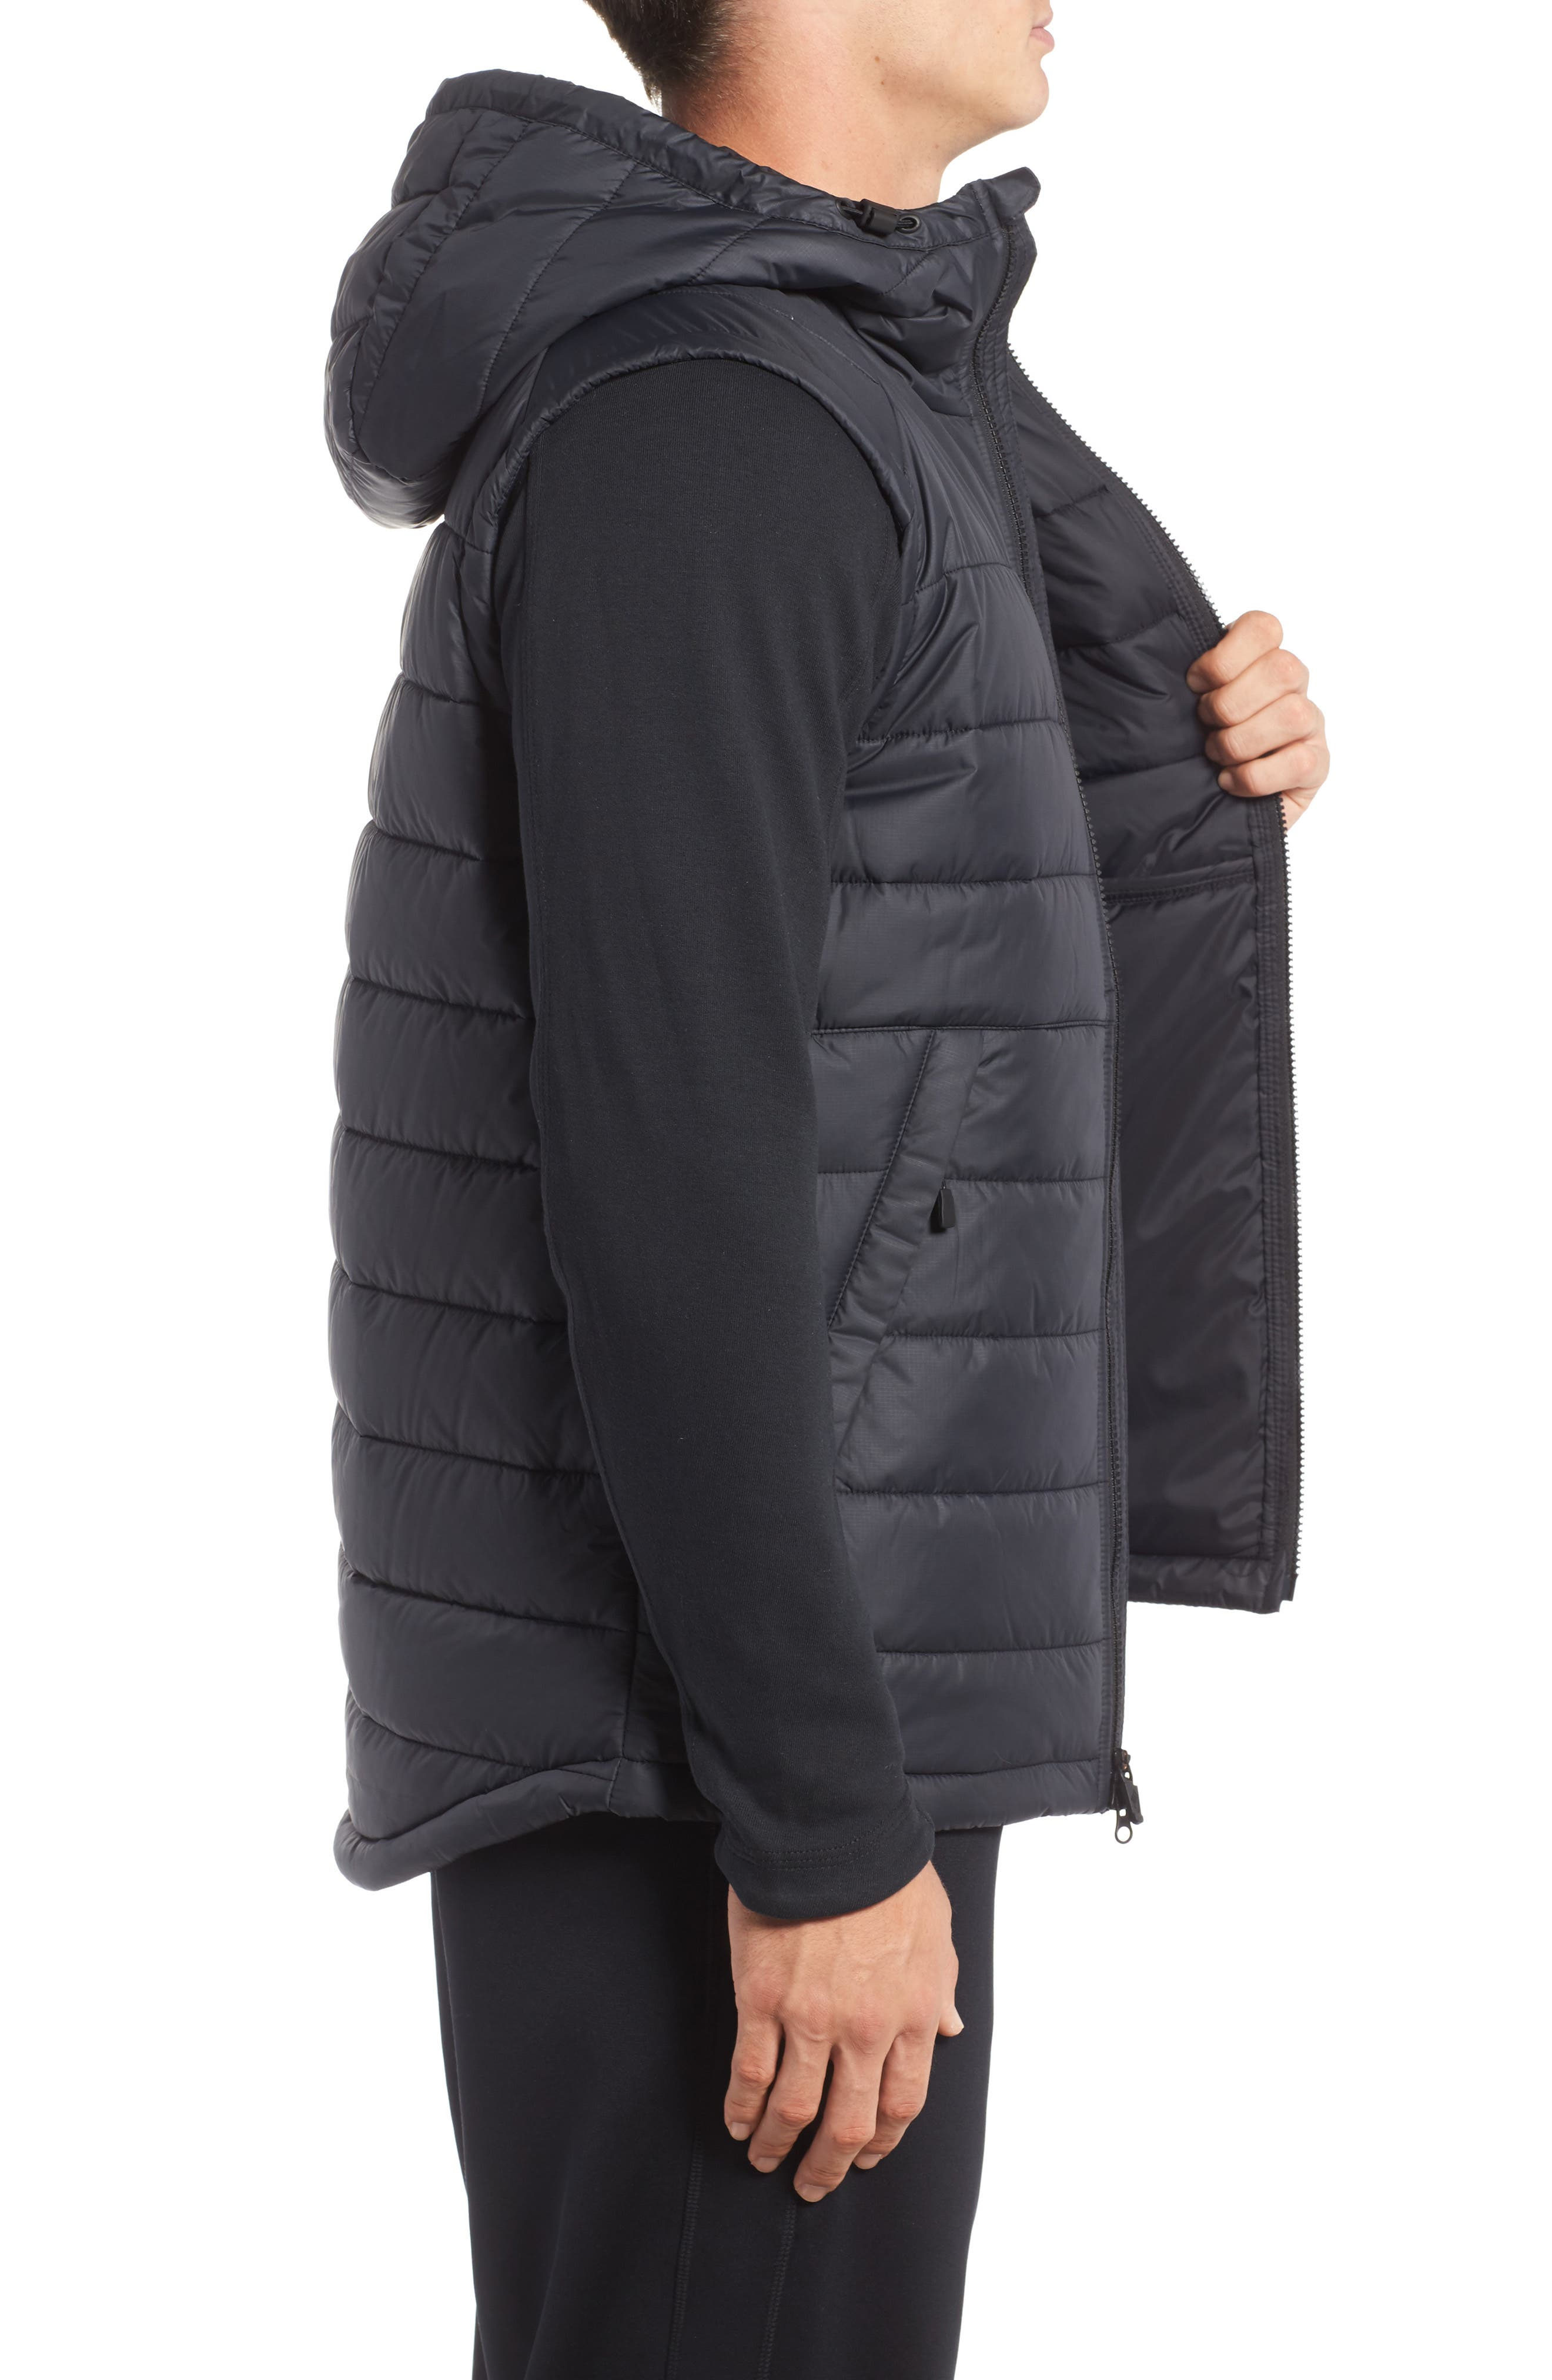 NIKE,                             Sportswear Advance 15 Jacket,                             Alternate thumbnail 3, color,                             010